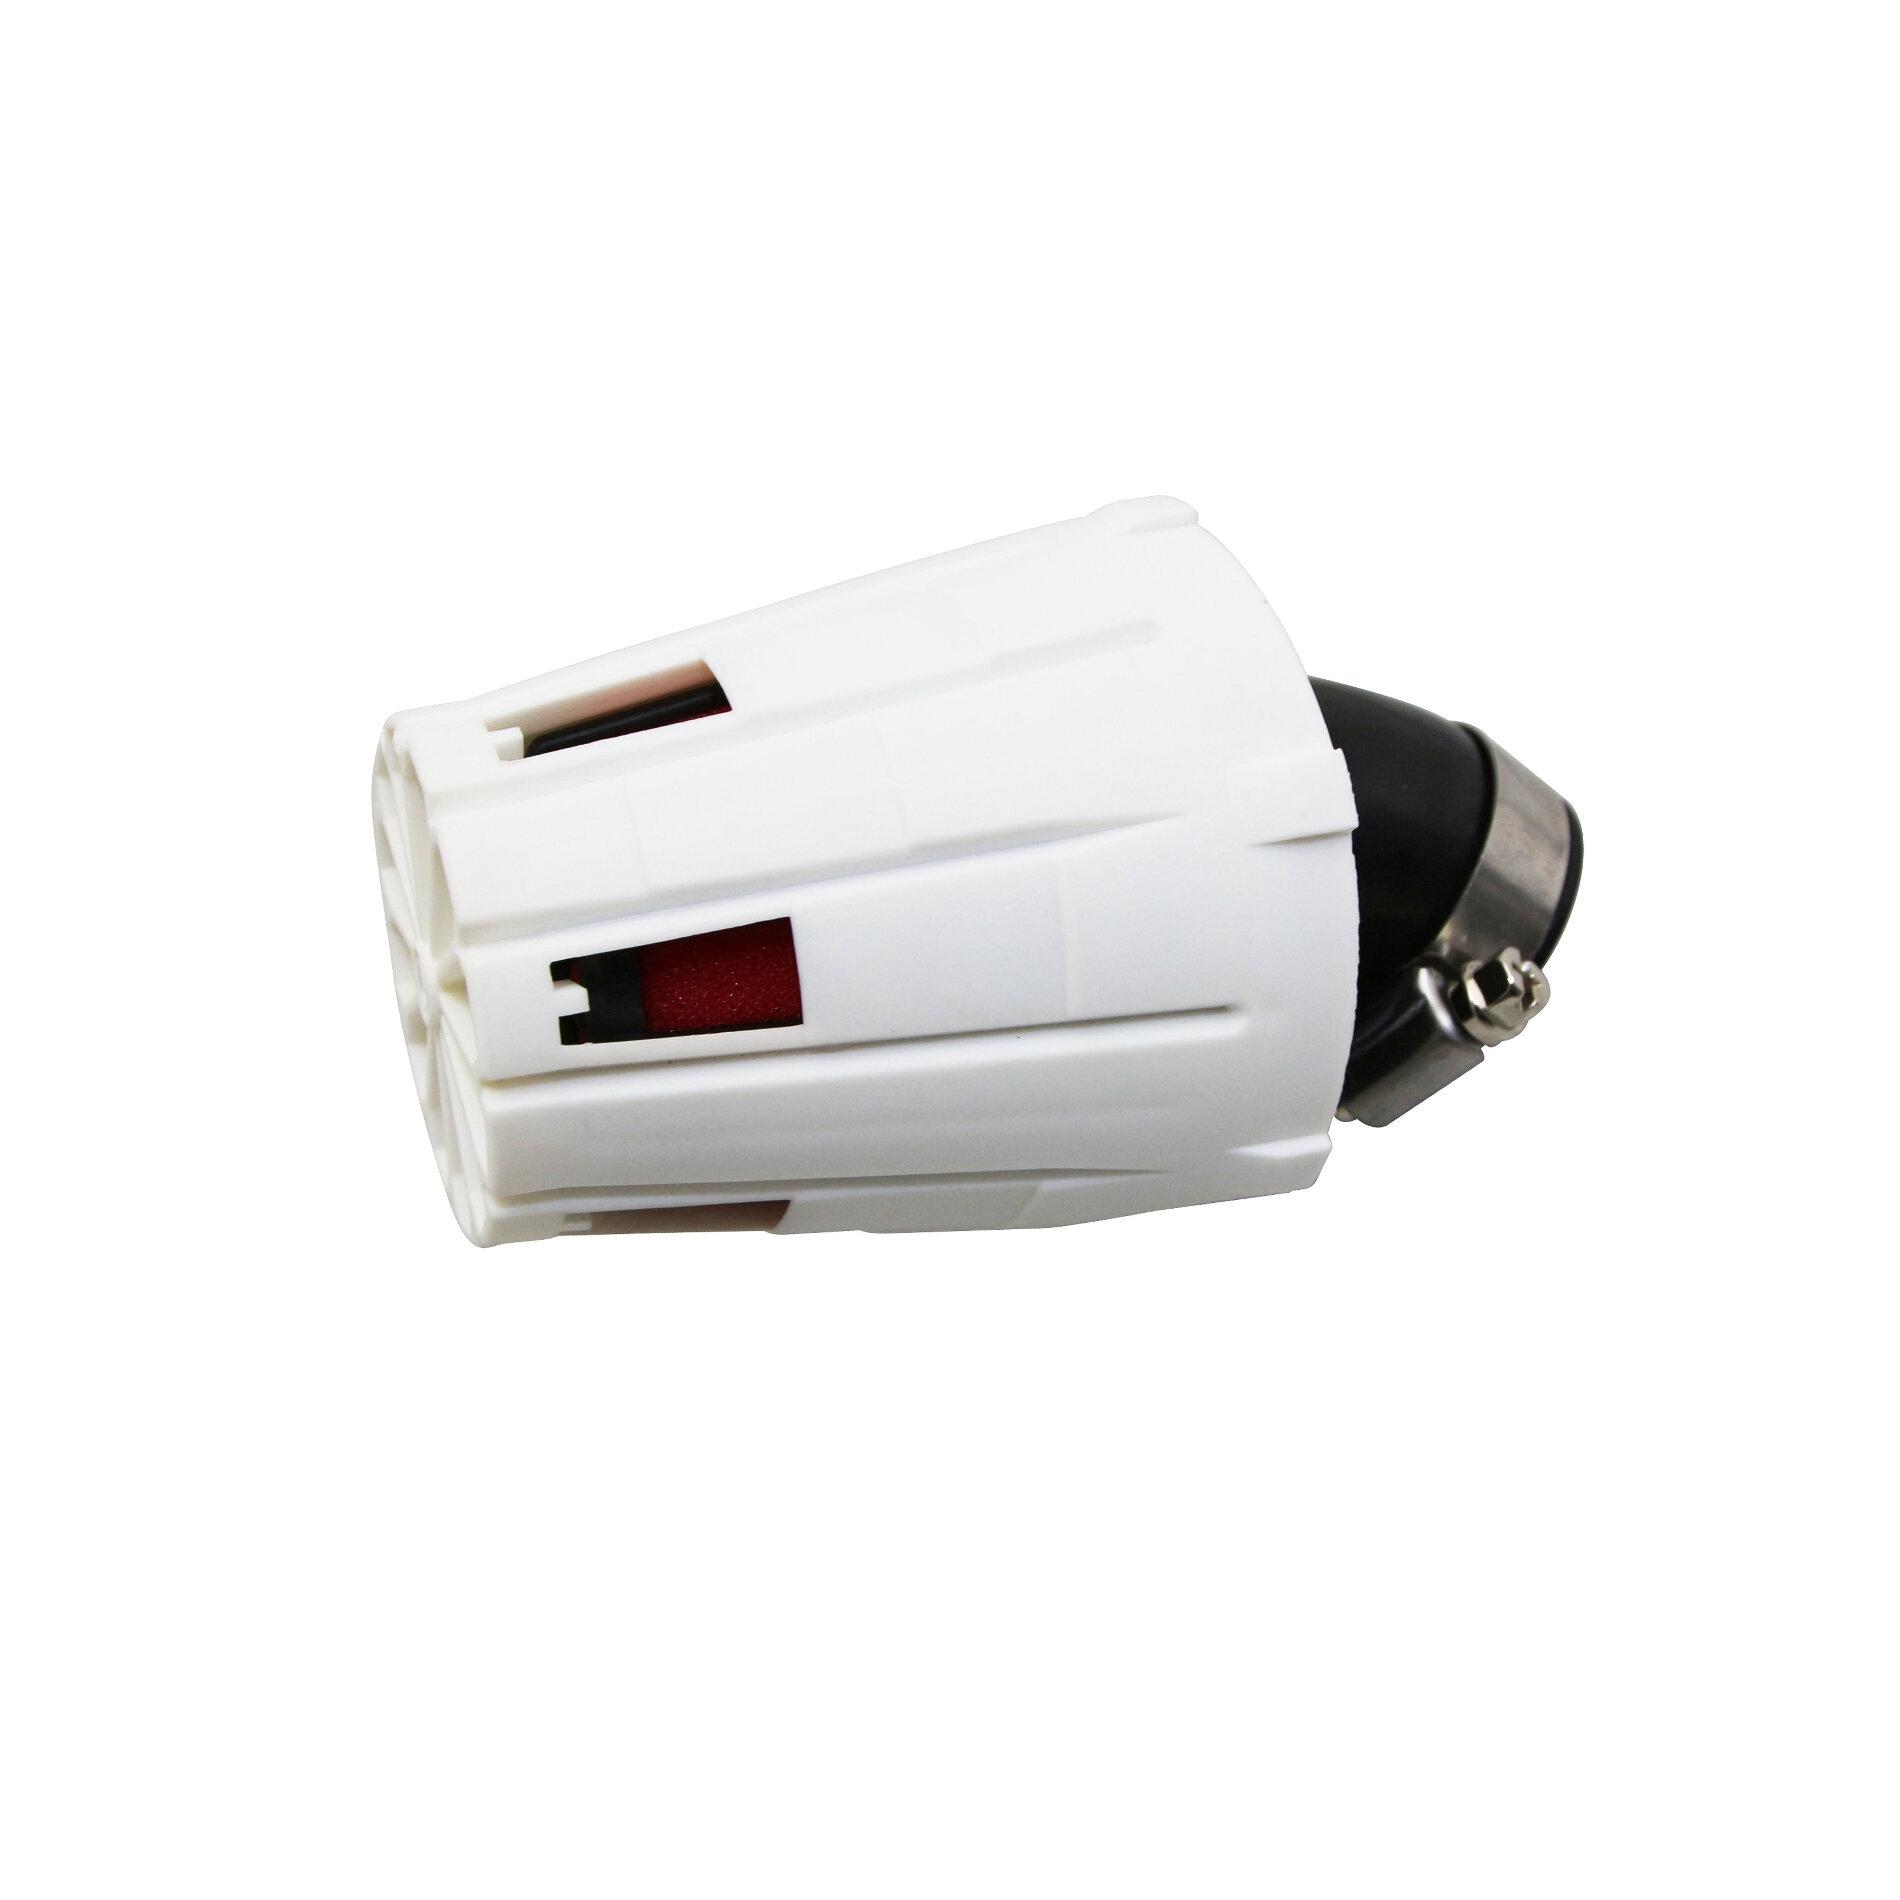 Filtre à air Replay E5 box blanc mousse rouge fixation universelle 0/4